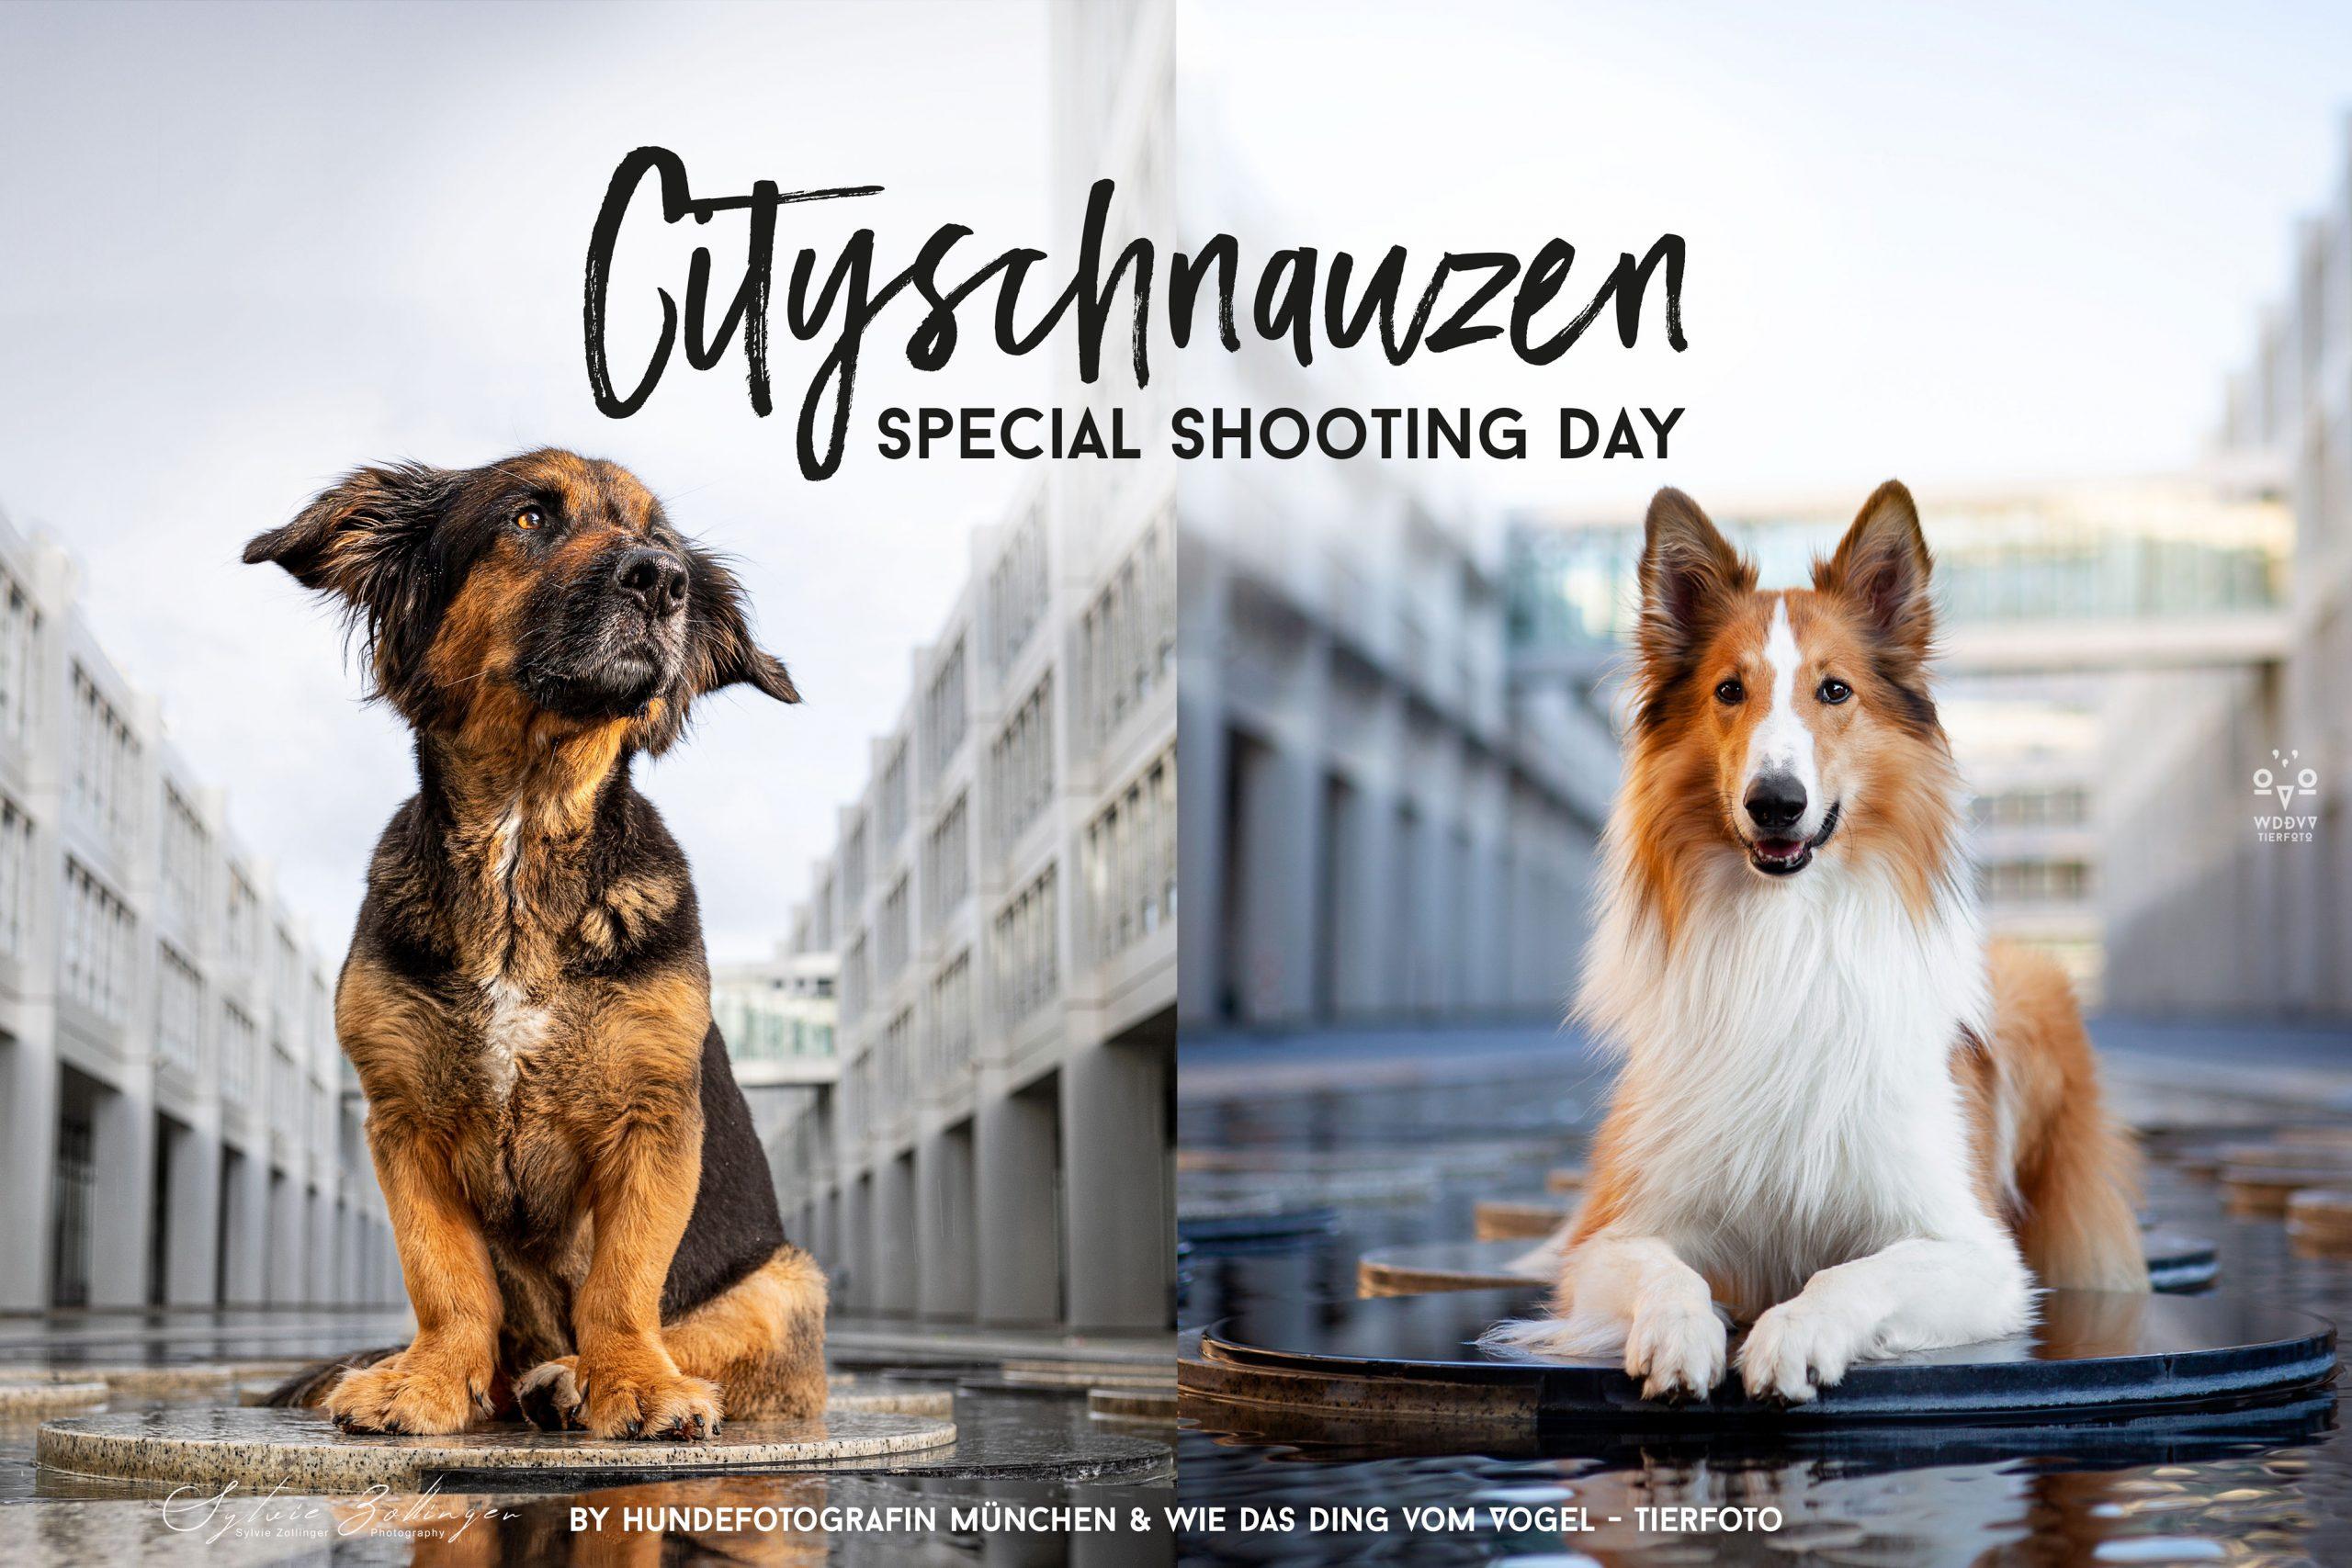 210407_Header_Cityschnauzen_web